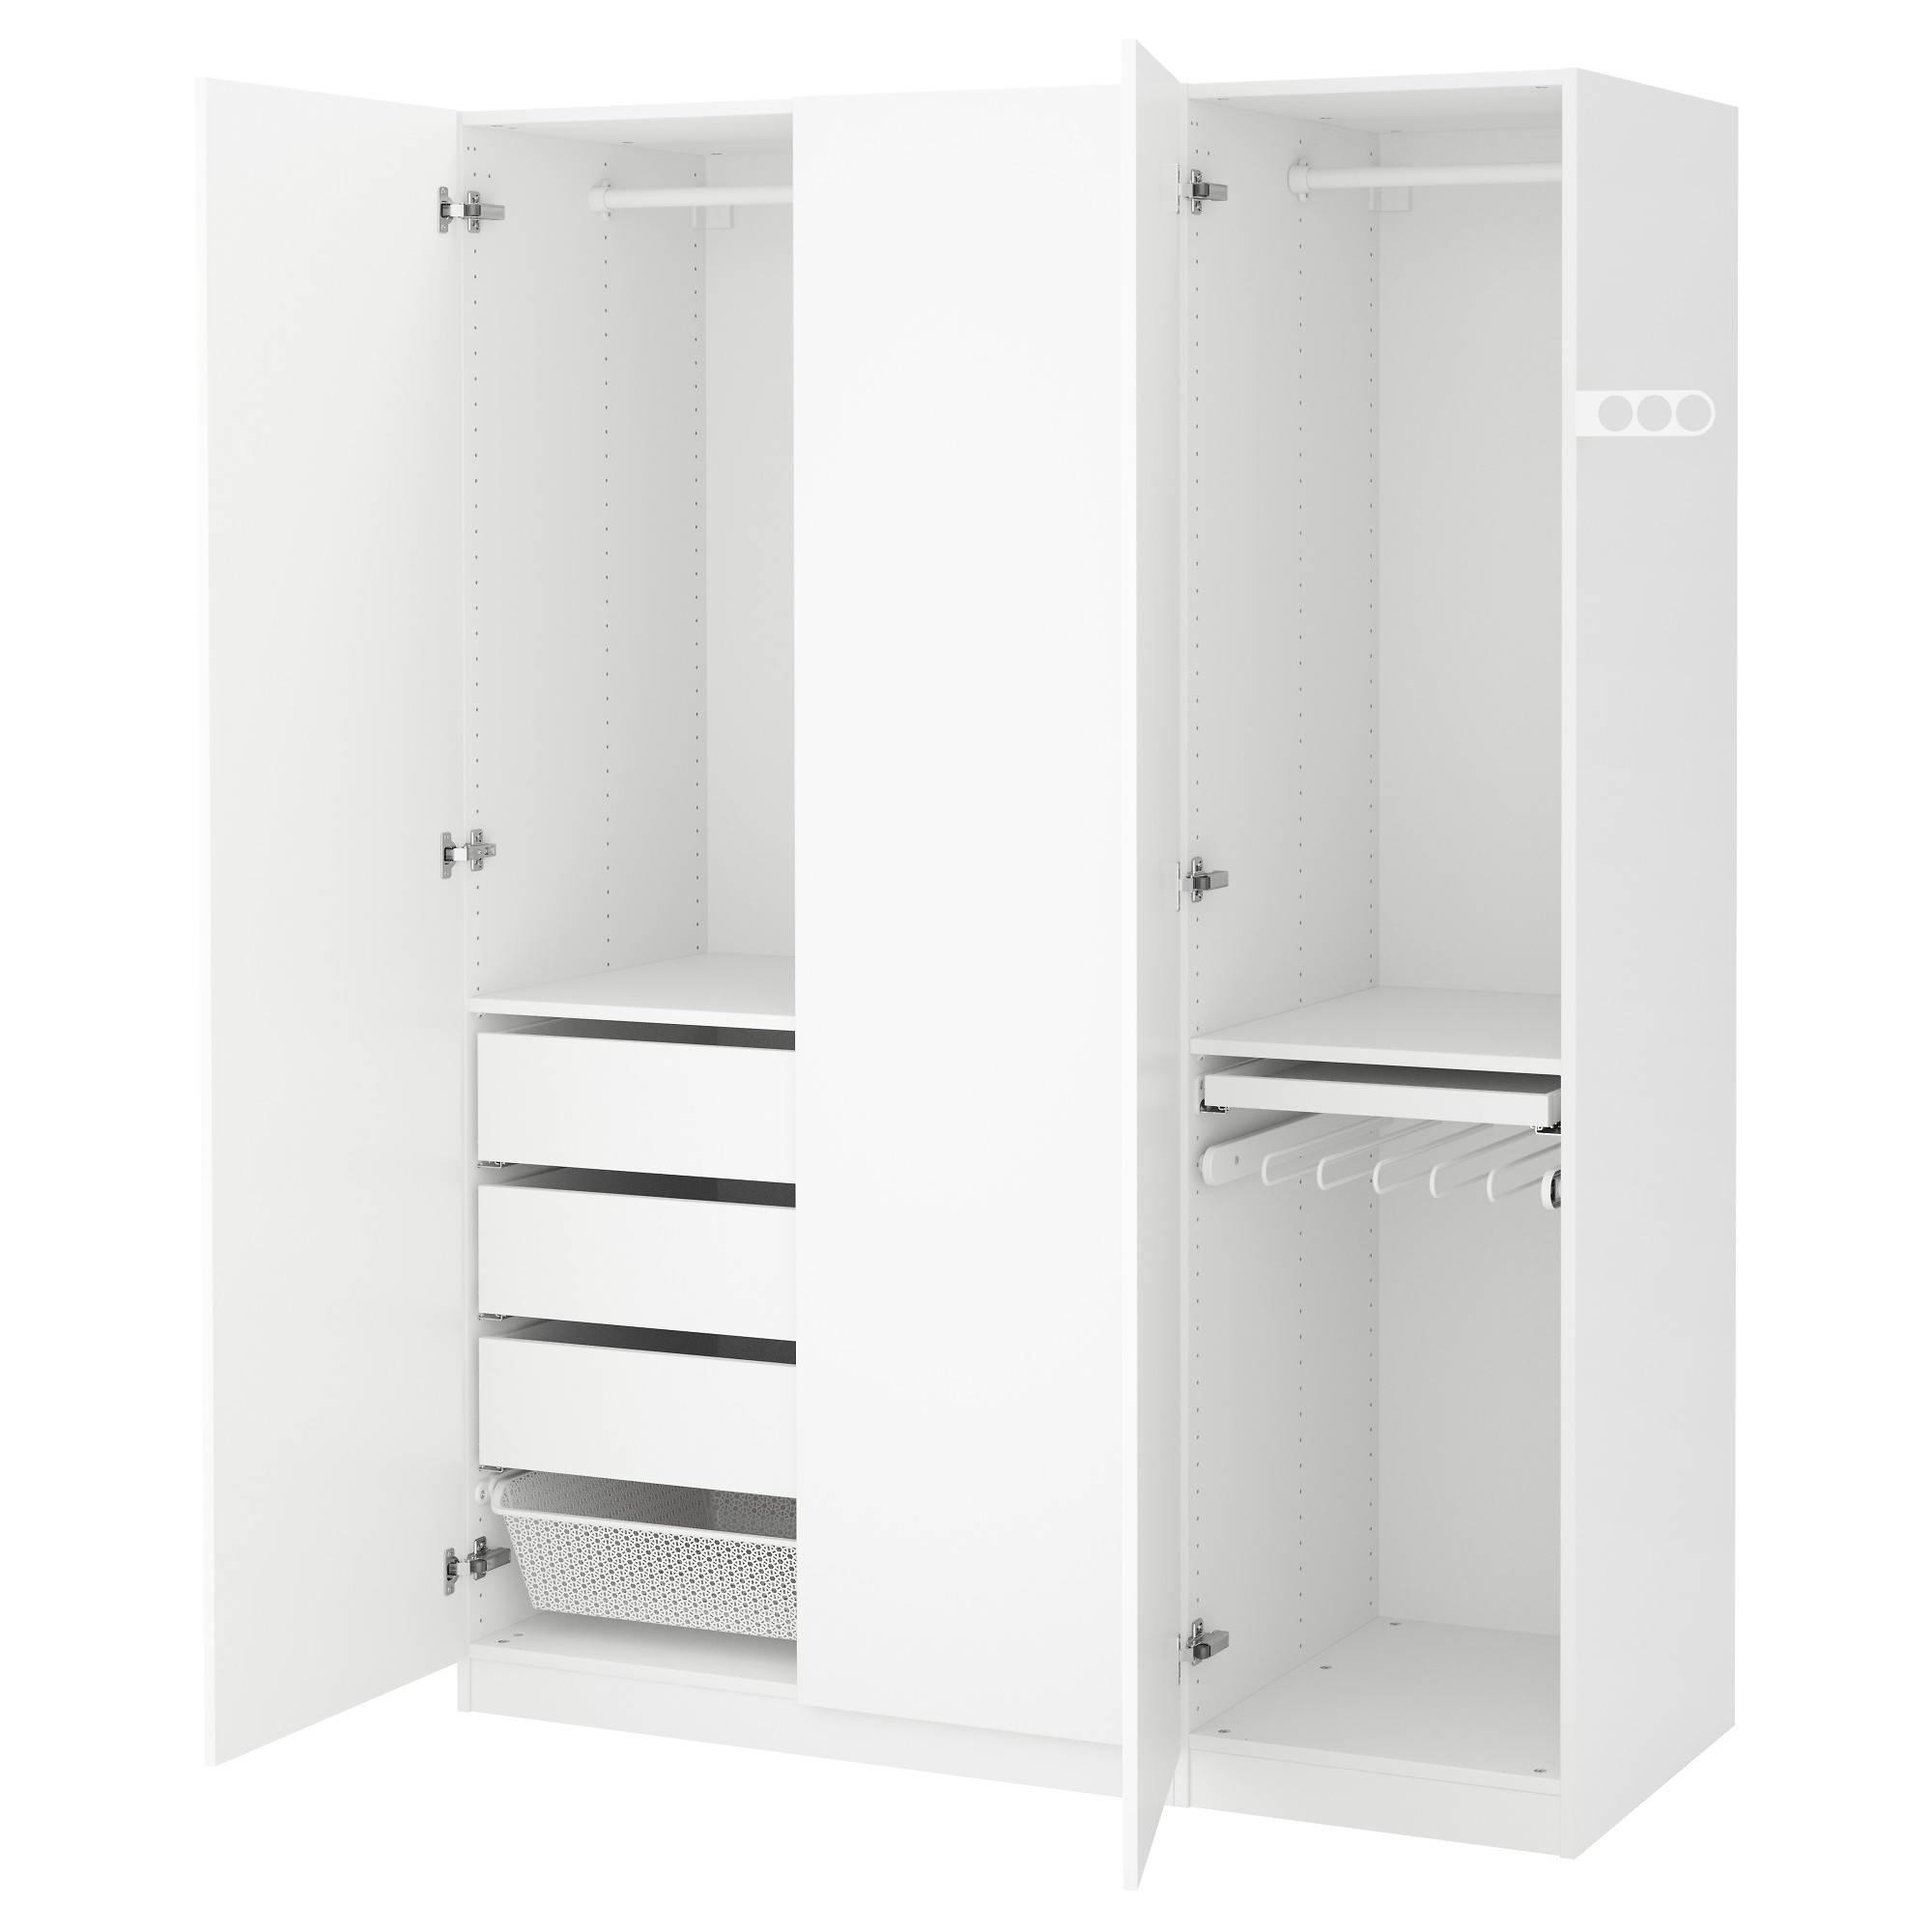 Wardrobes | Ikea Regarding Double Rail Wardrobes (View 26 of 30)